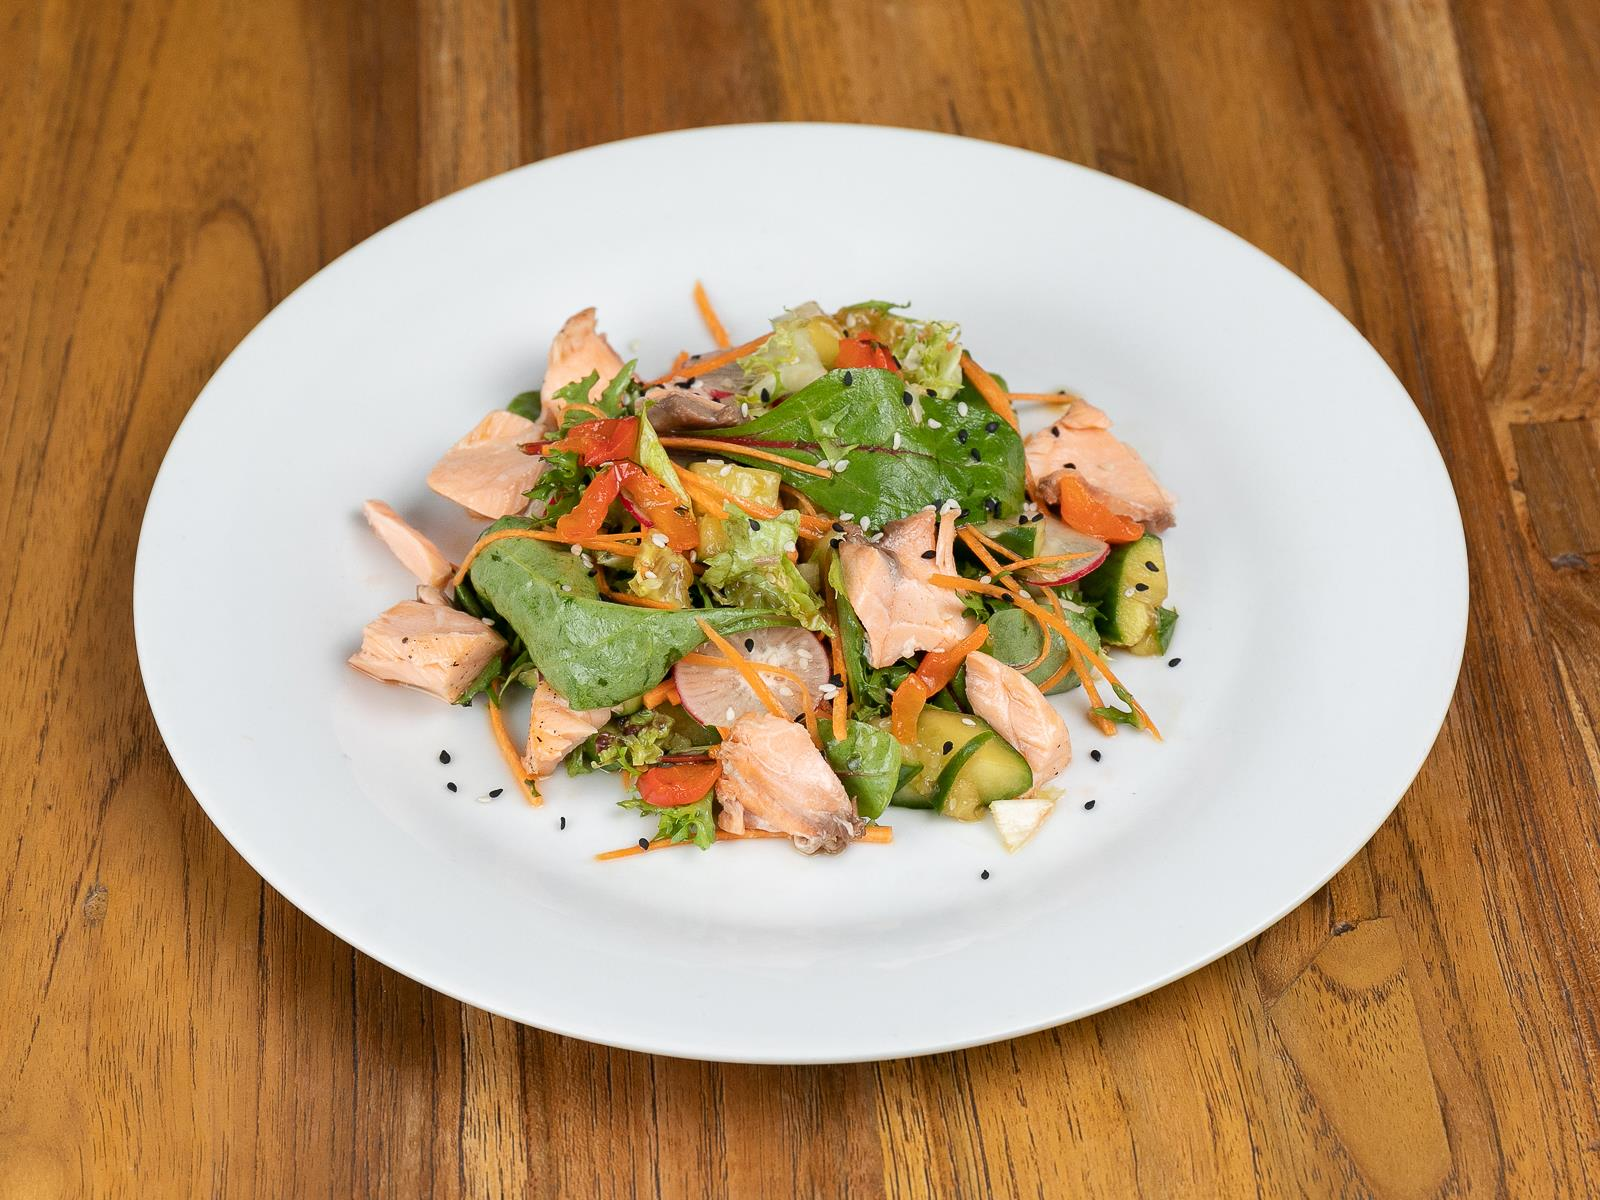 Салат с лососем и битыми огурцами